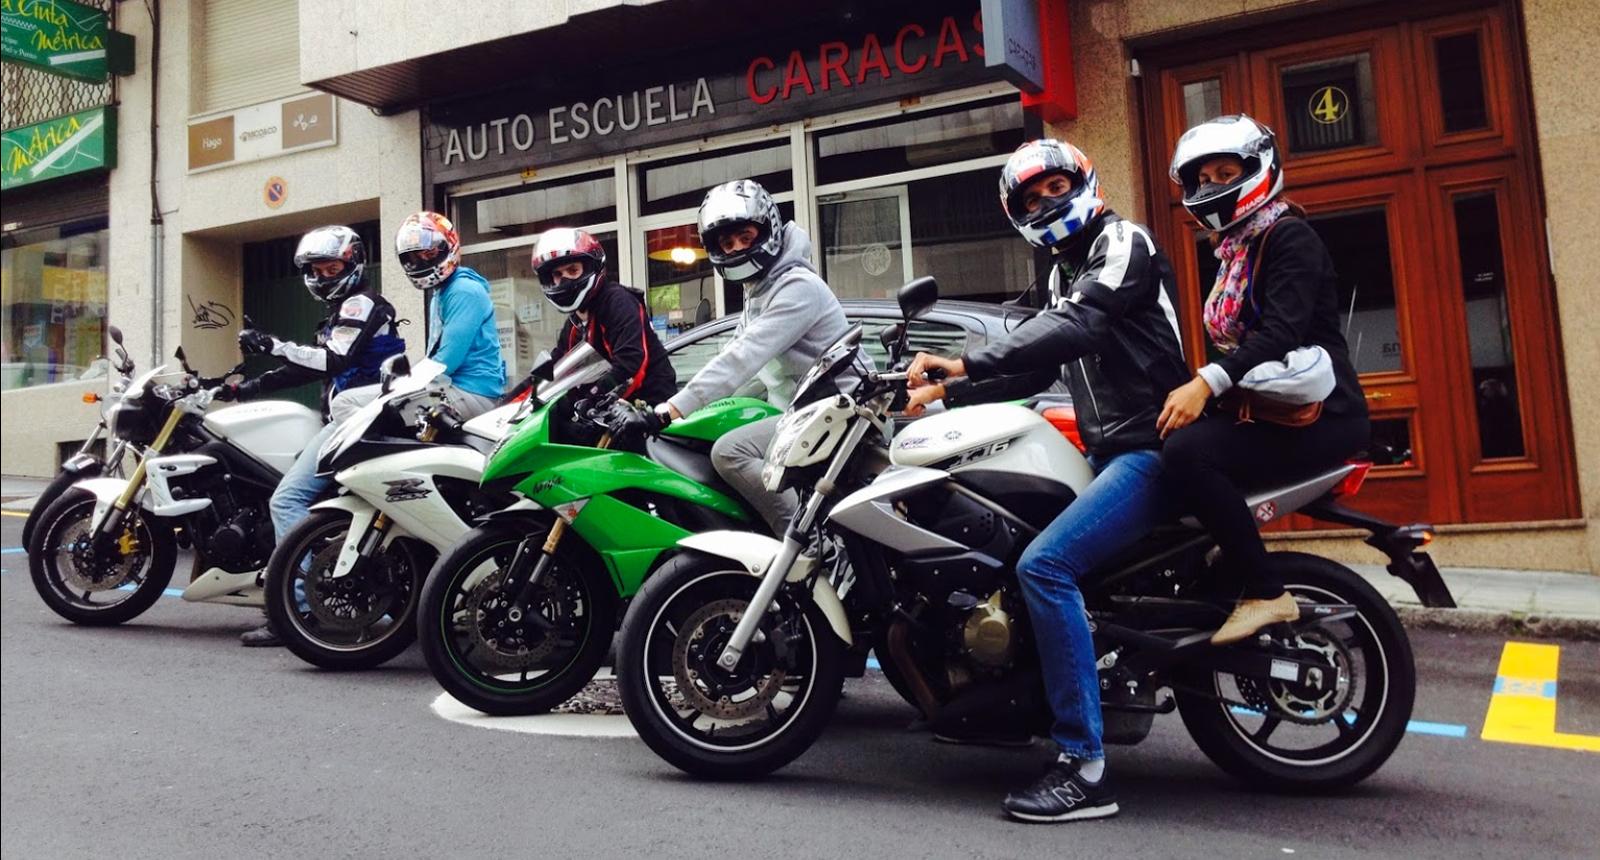 Autoescuela_Caracas_Vigo